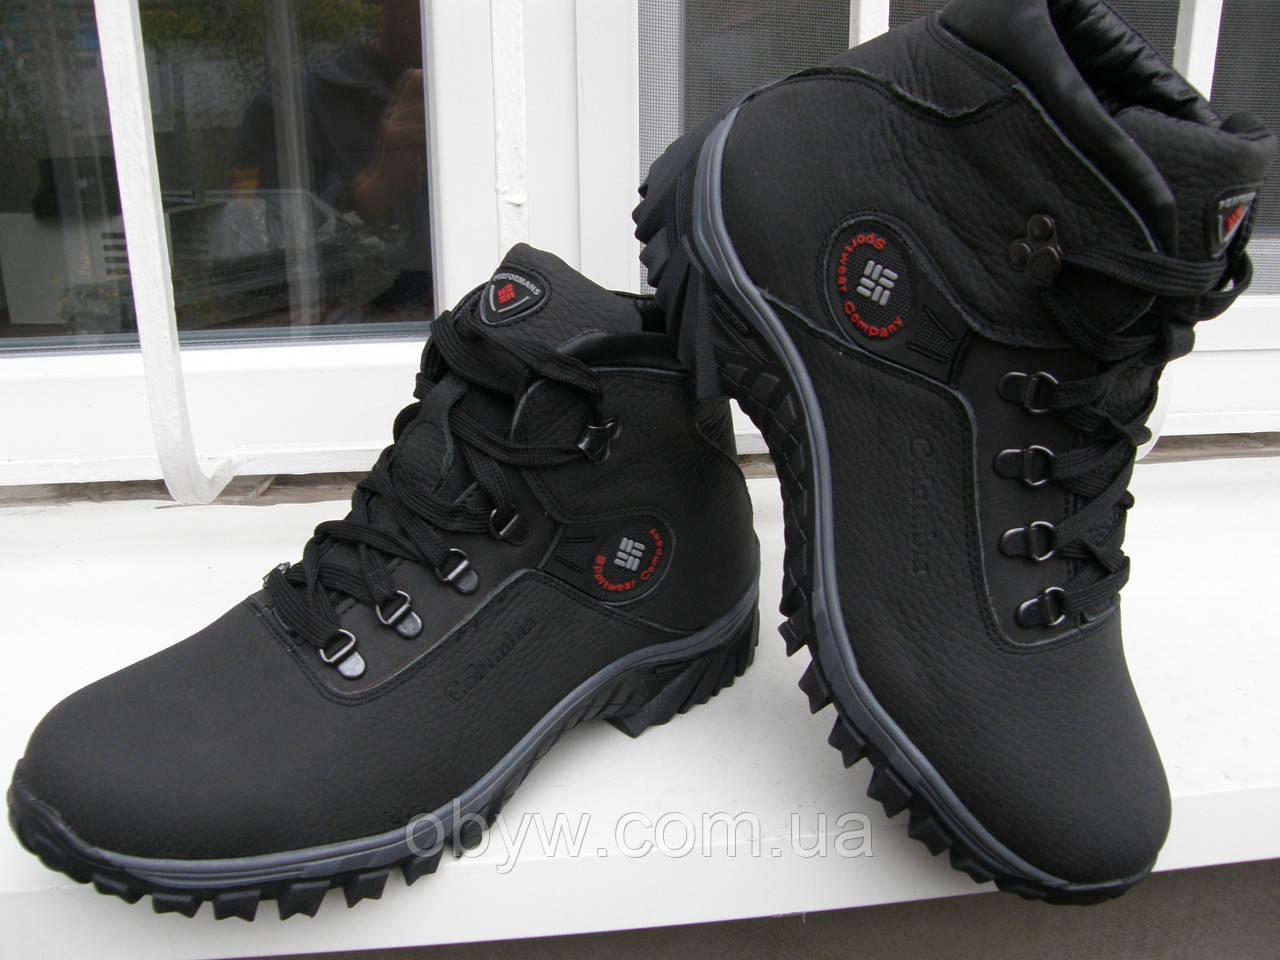 Мужская зимняя обувь, цена 1 250 грн., купить в Днепре — Prom.ua (ID ... 64dfd381a85